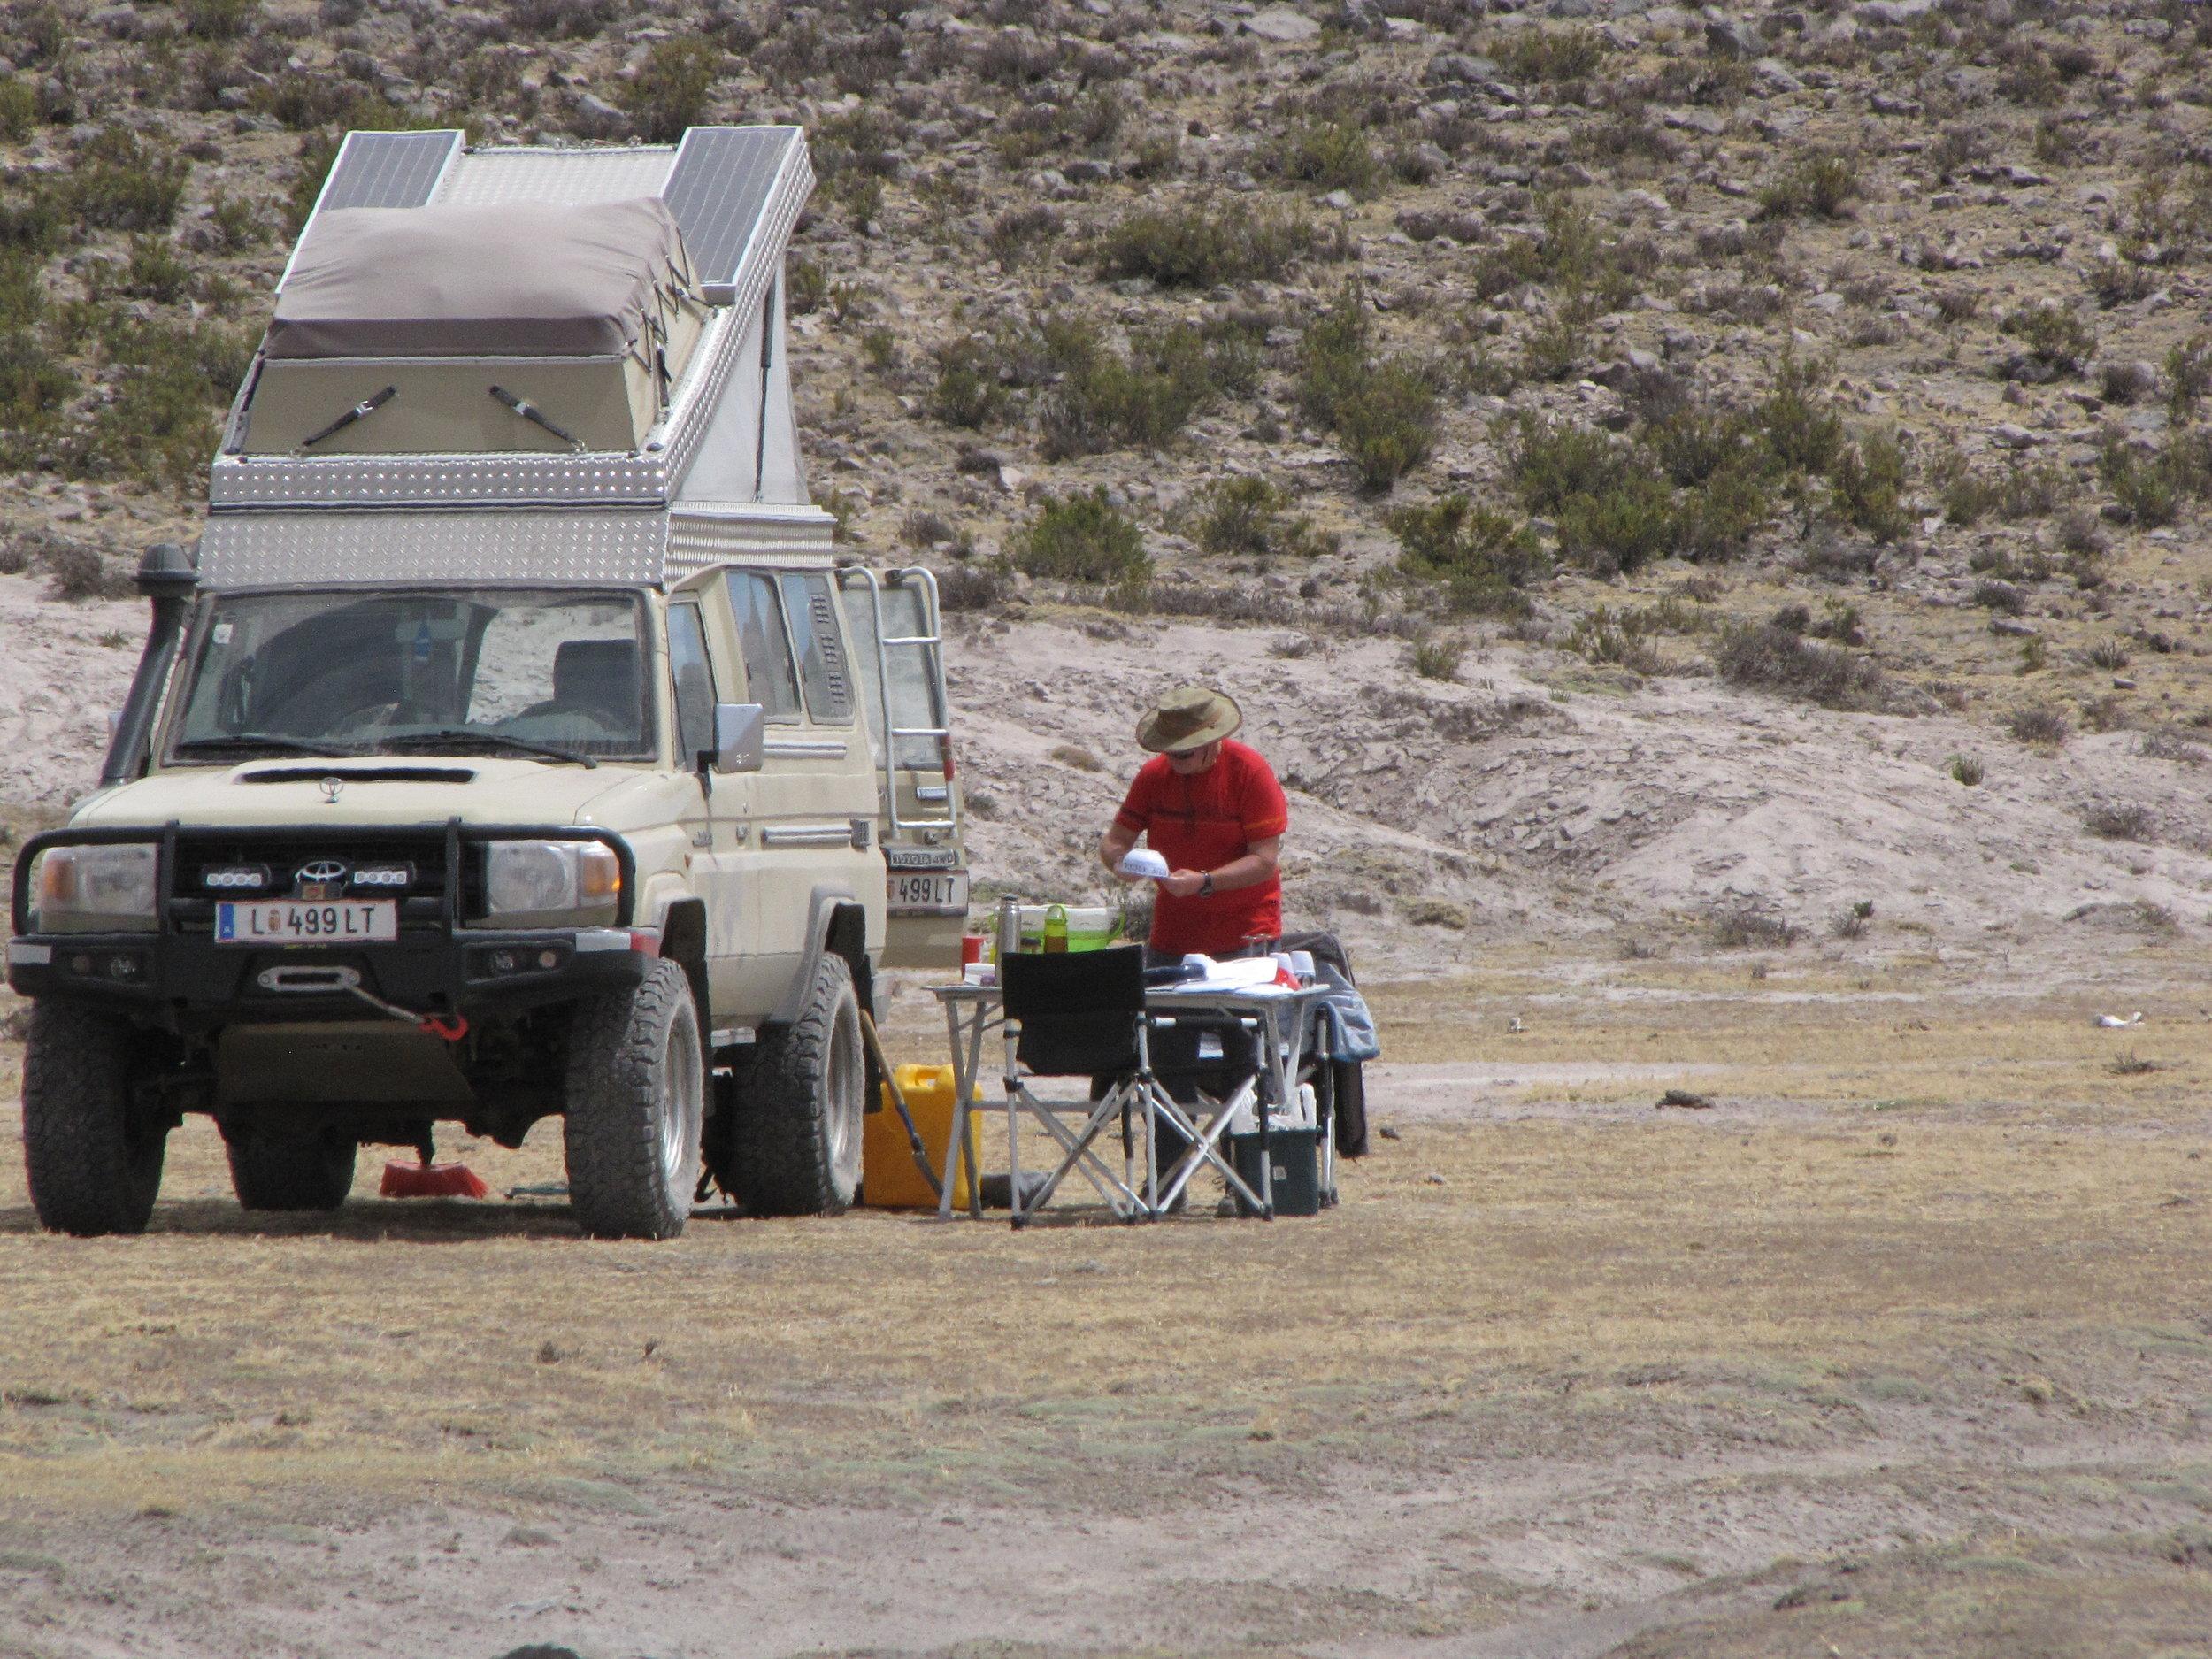 Breakfeast at 5,000 m in southern Peru